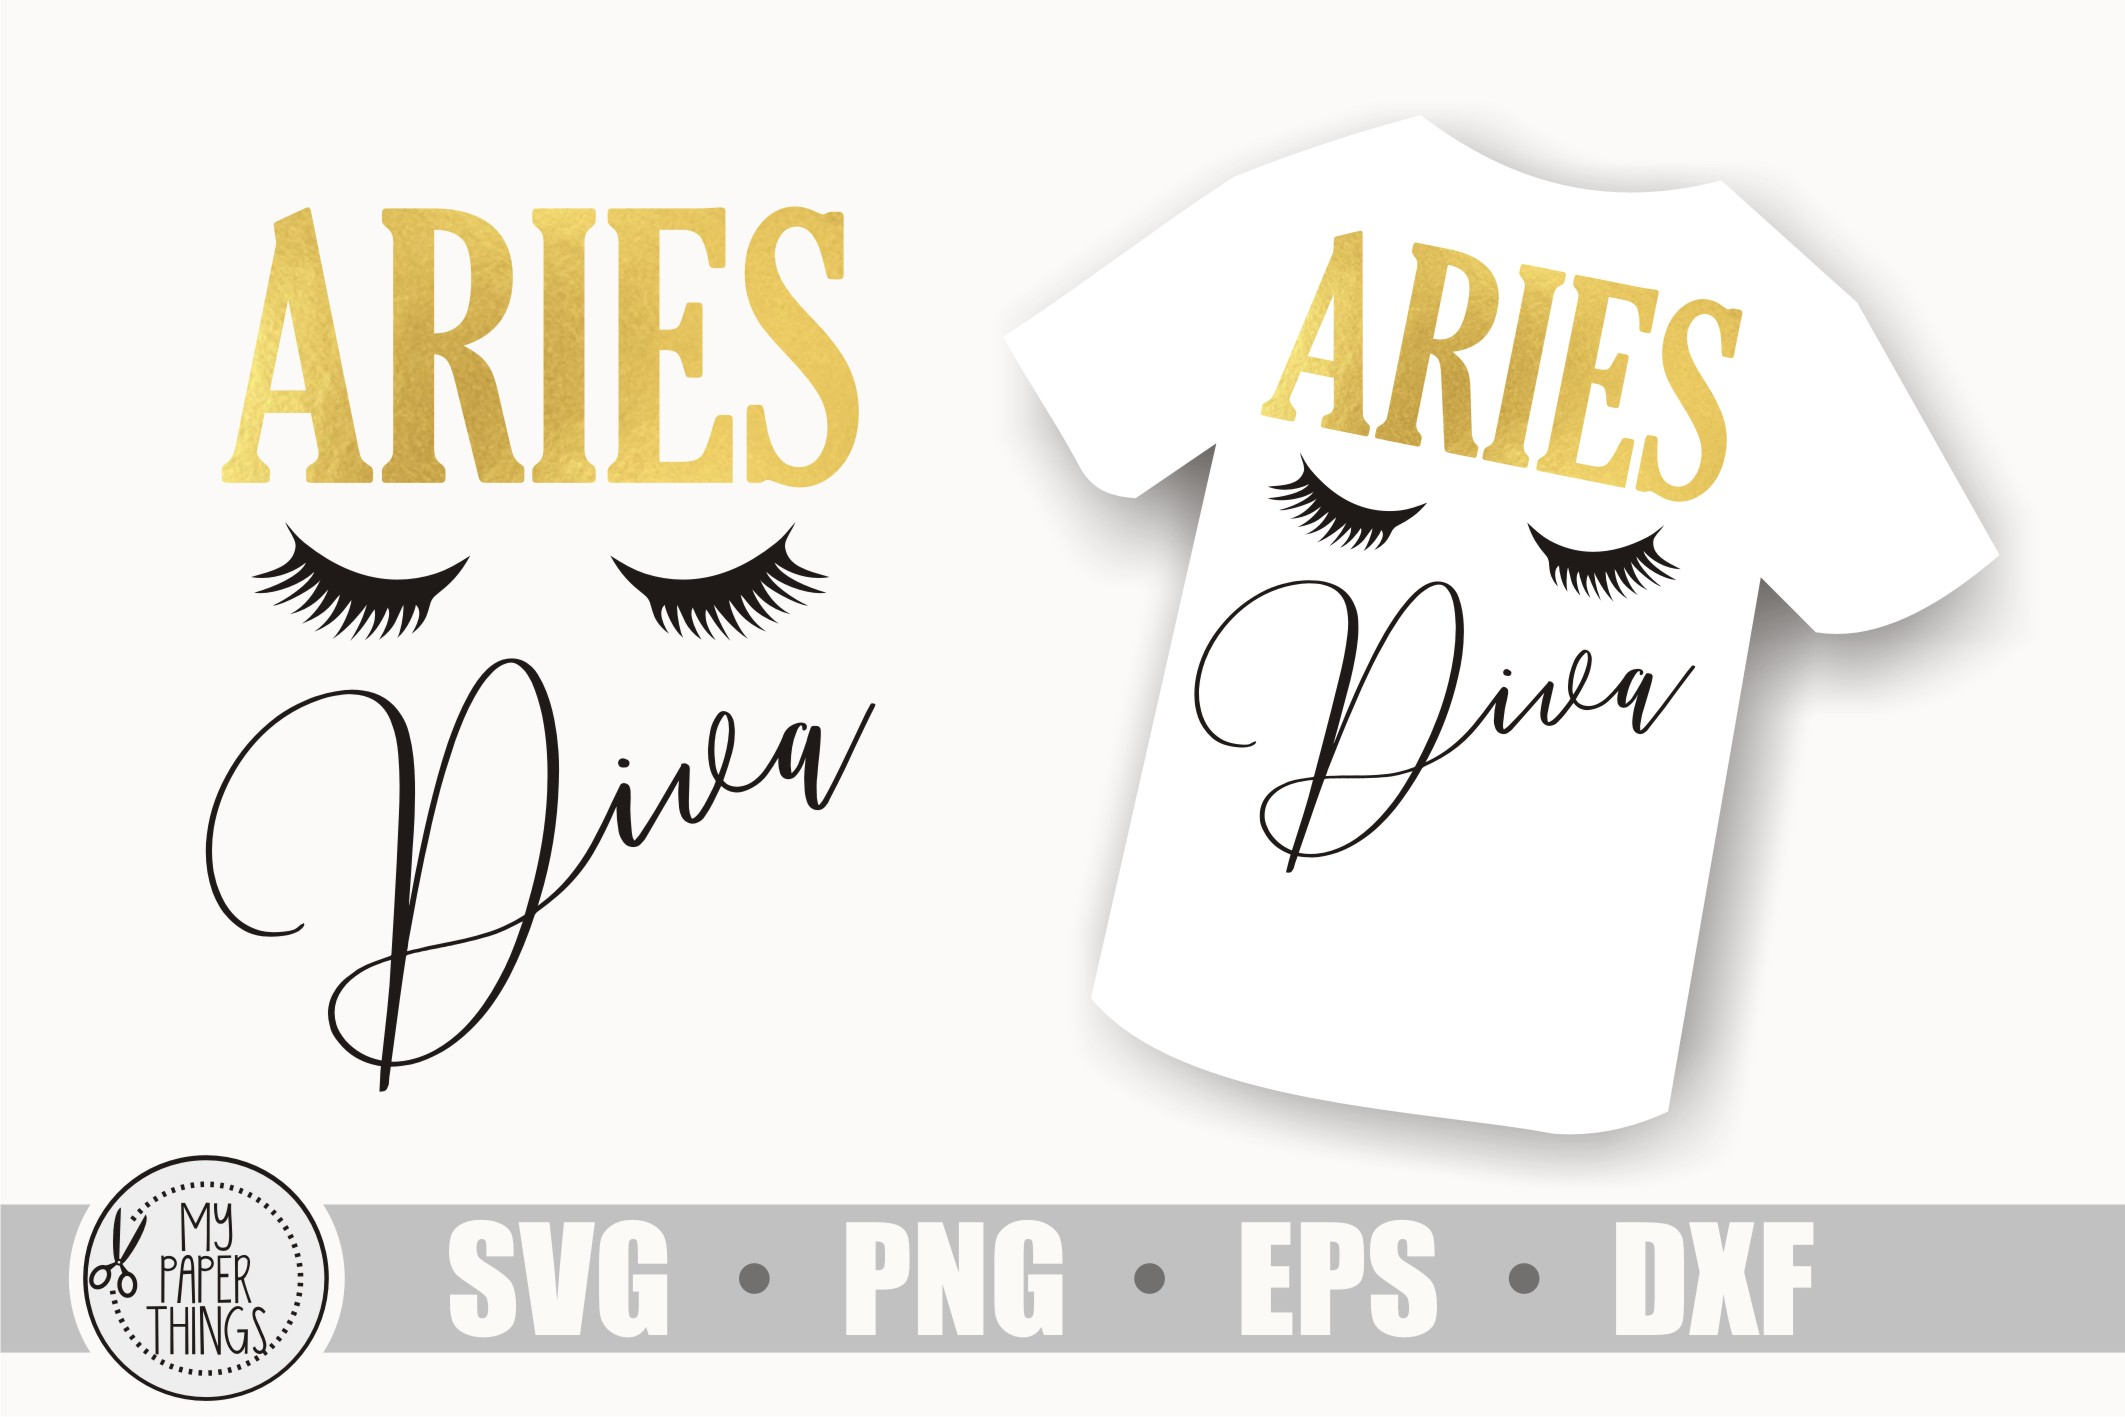 Aries svg bundle, Birthday svg, Zodiac sign example image 5